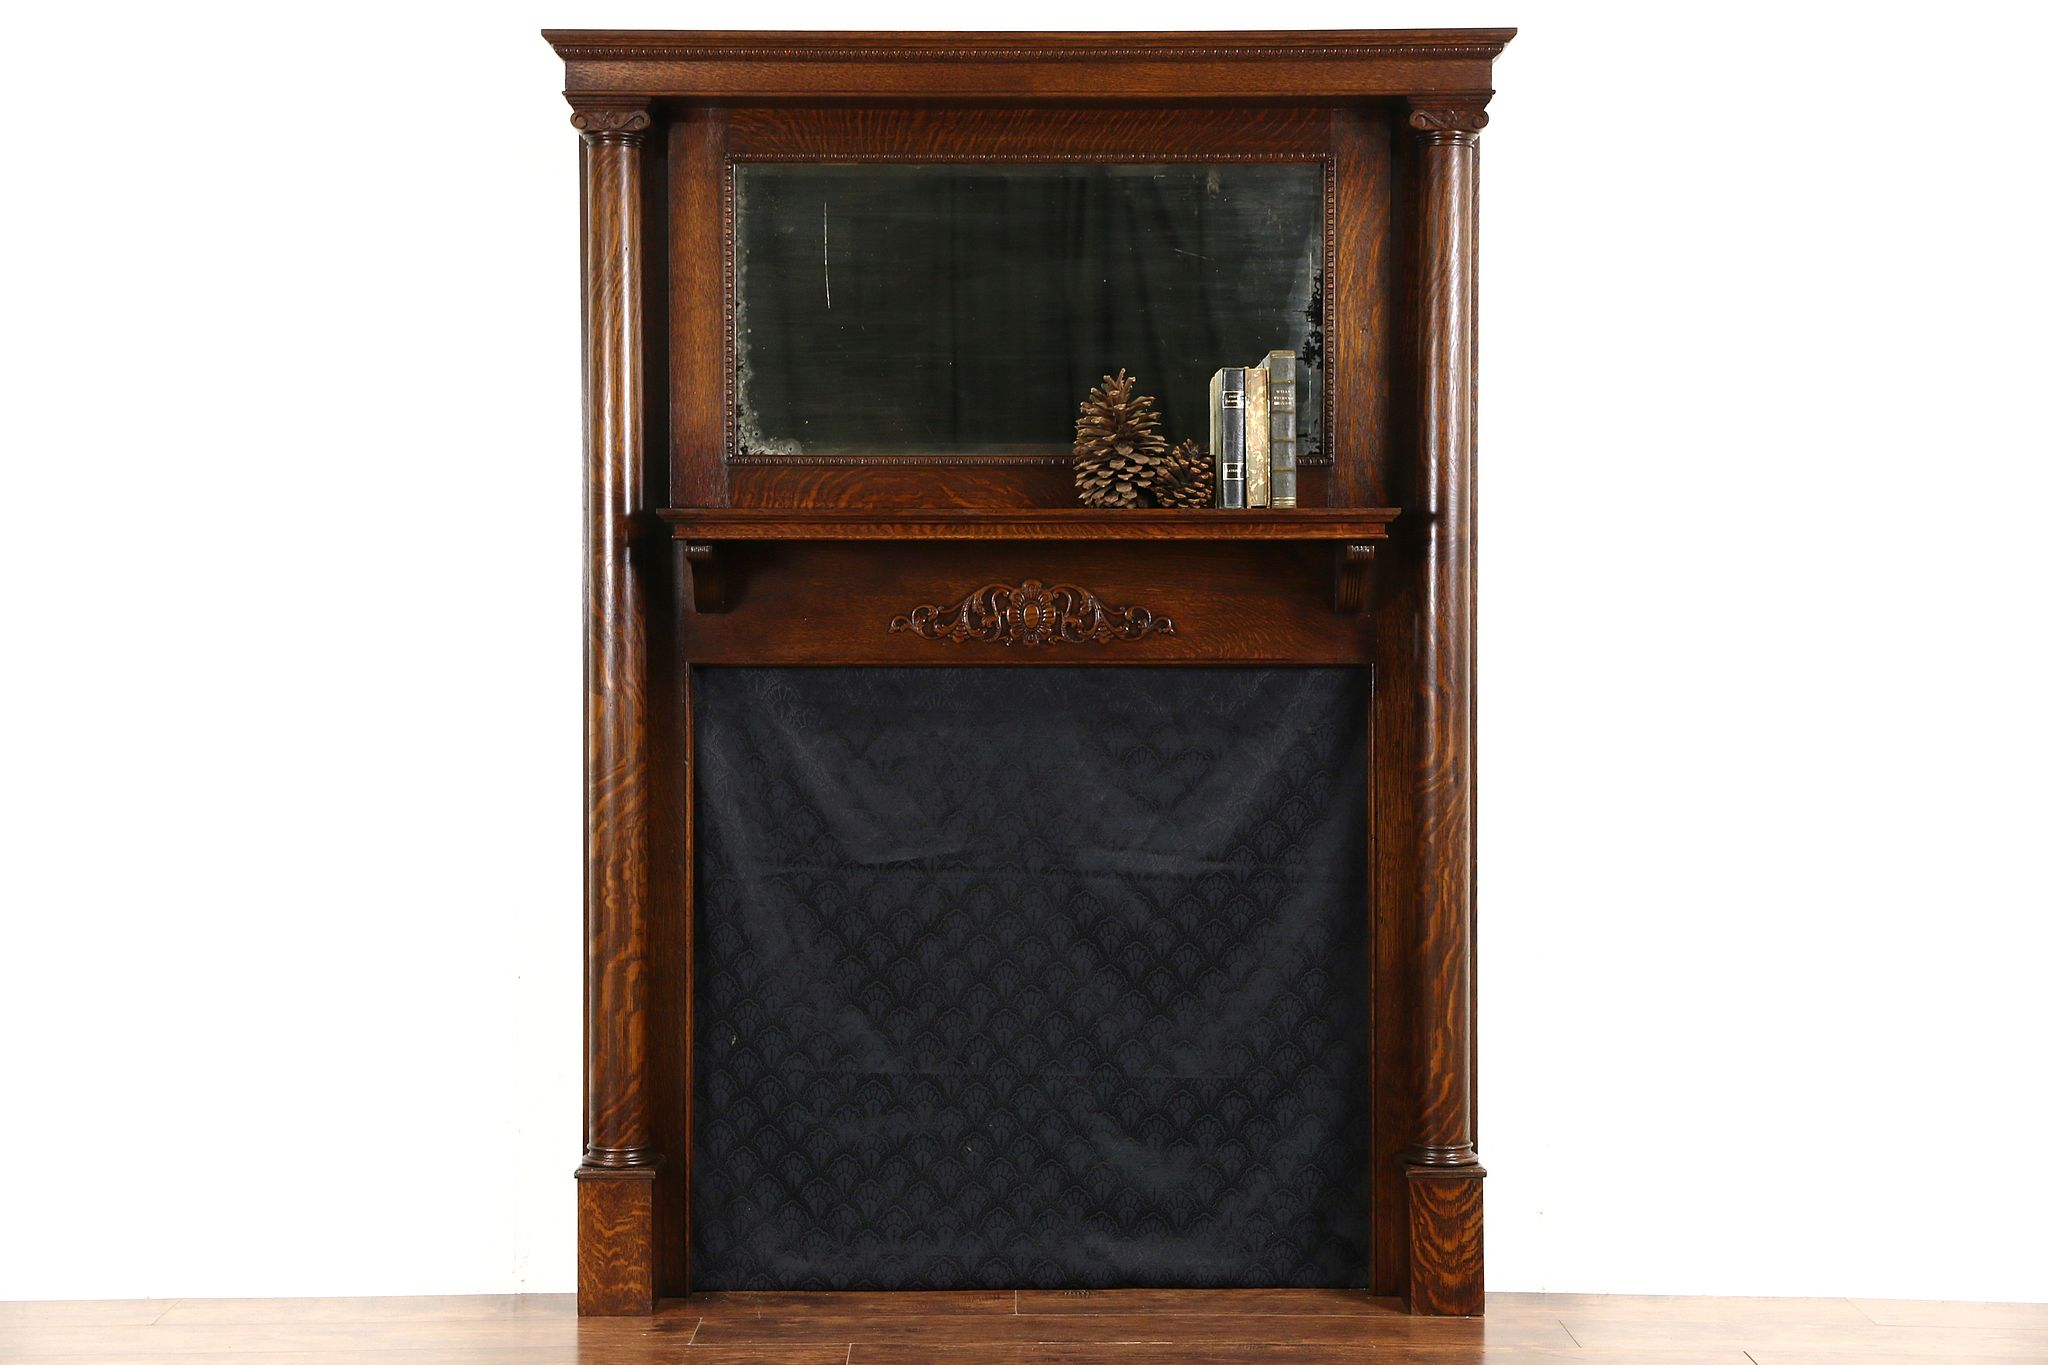 sold fireplace mantel surround u0026 mirror 1900 antique